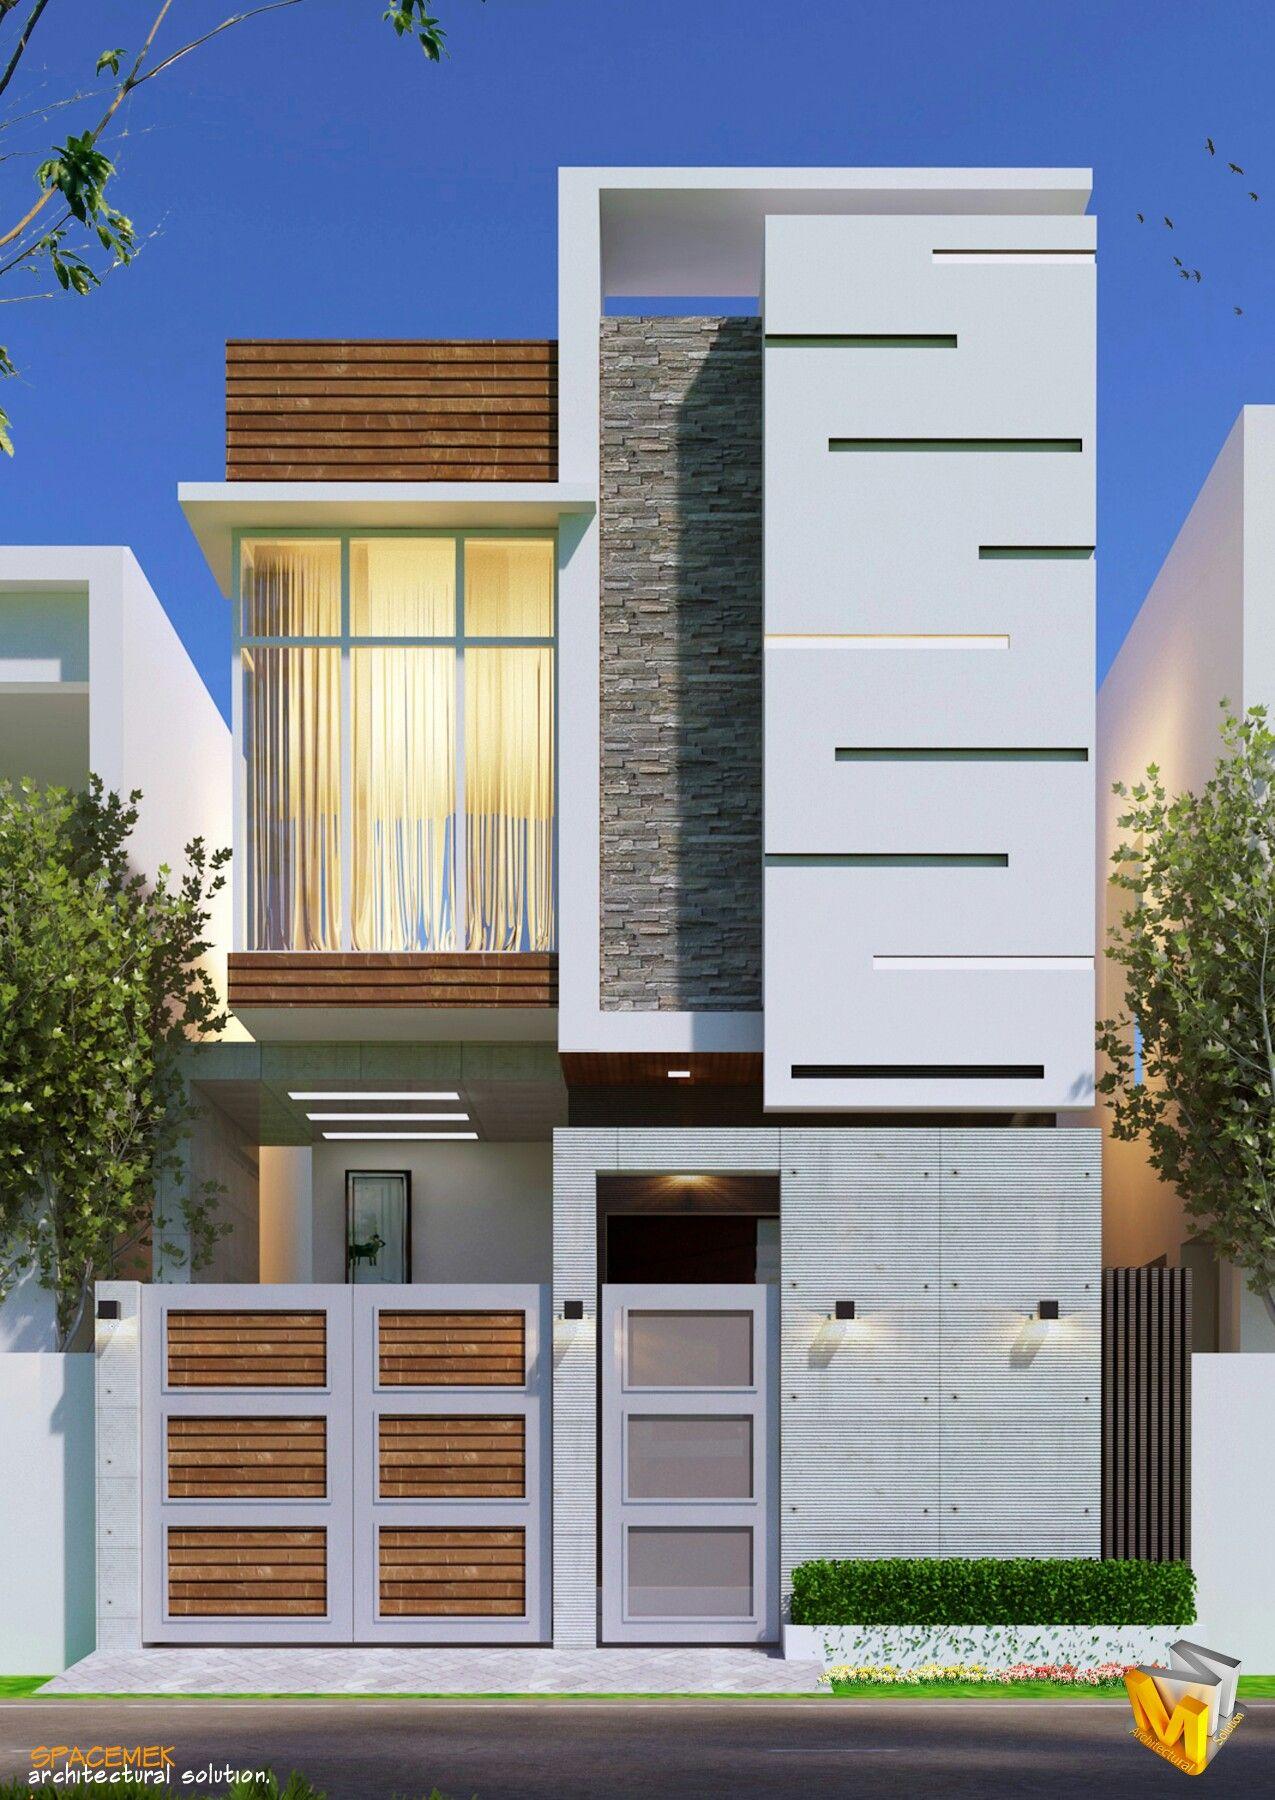 Small House Elevation Design Duplex House Design Latest House Designs: Bungalow House Design, Architectural House Plans, Duplex House Design